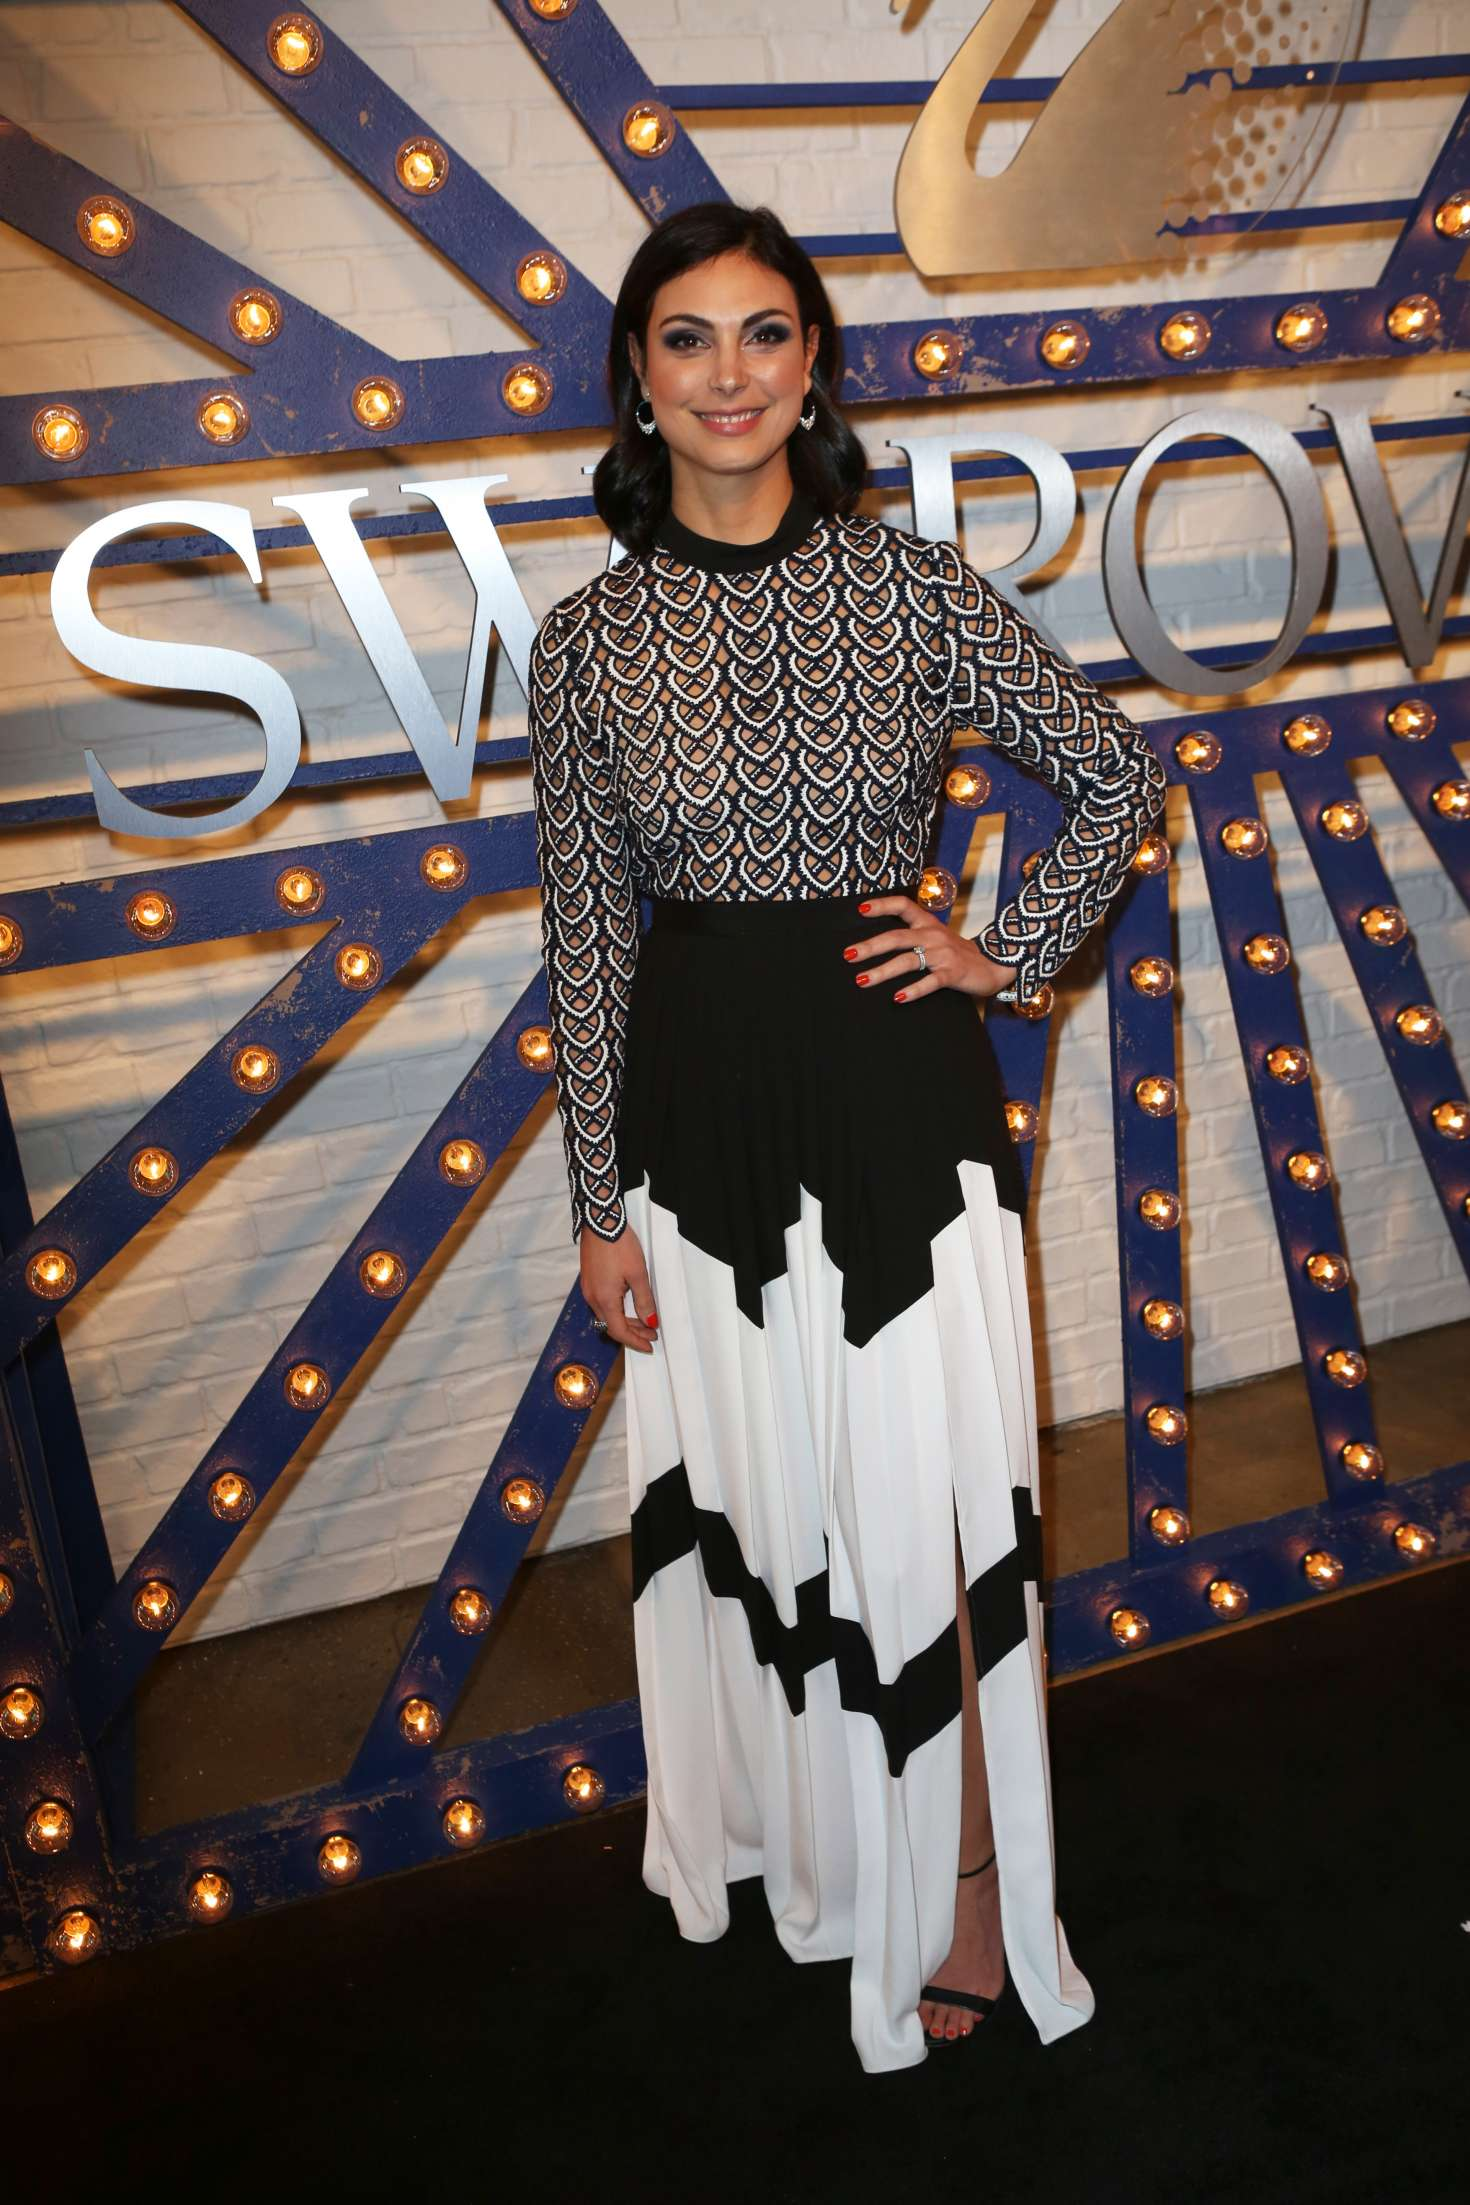 Morena Baccarin 2018 : Morena Baccarin: Swarovski Times Square Store Party -05